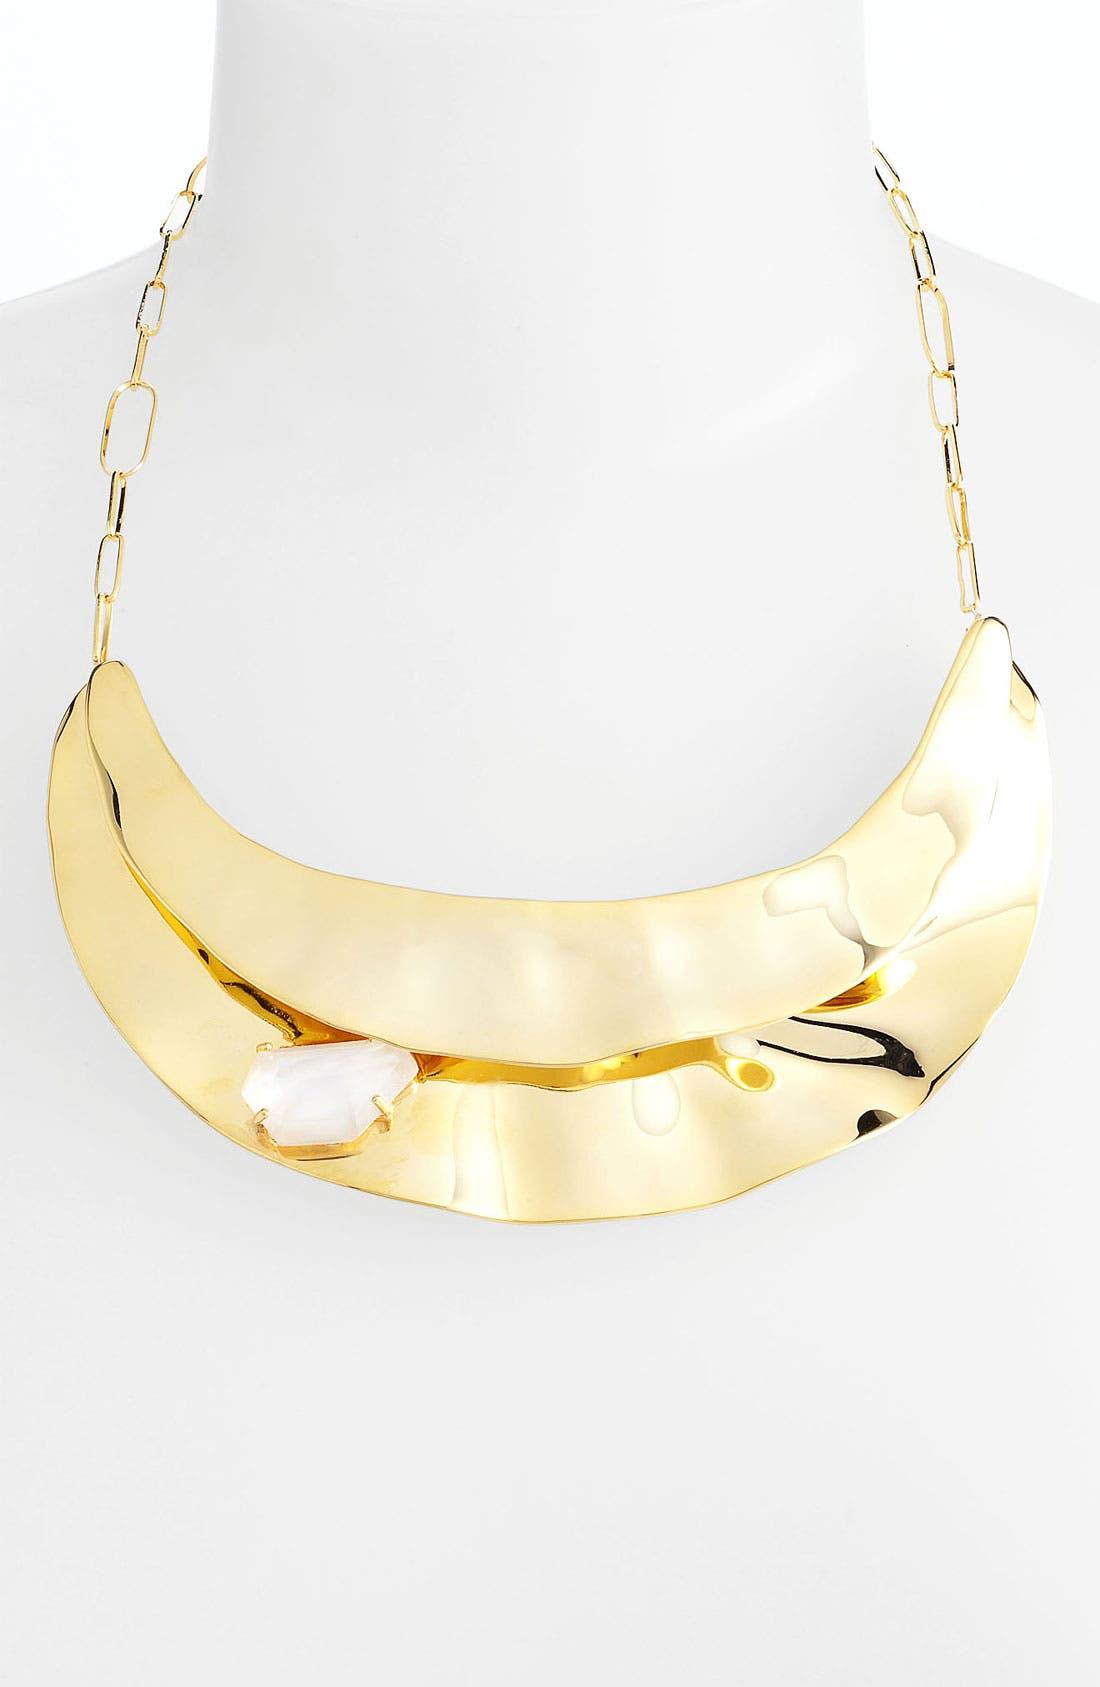 Alternate Image 1 Selected - Alexis Bittar 'Miss Havisham - Bel Air' Tiered Frontal Necklace